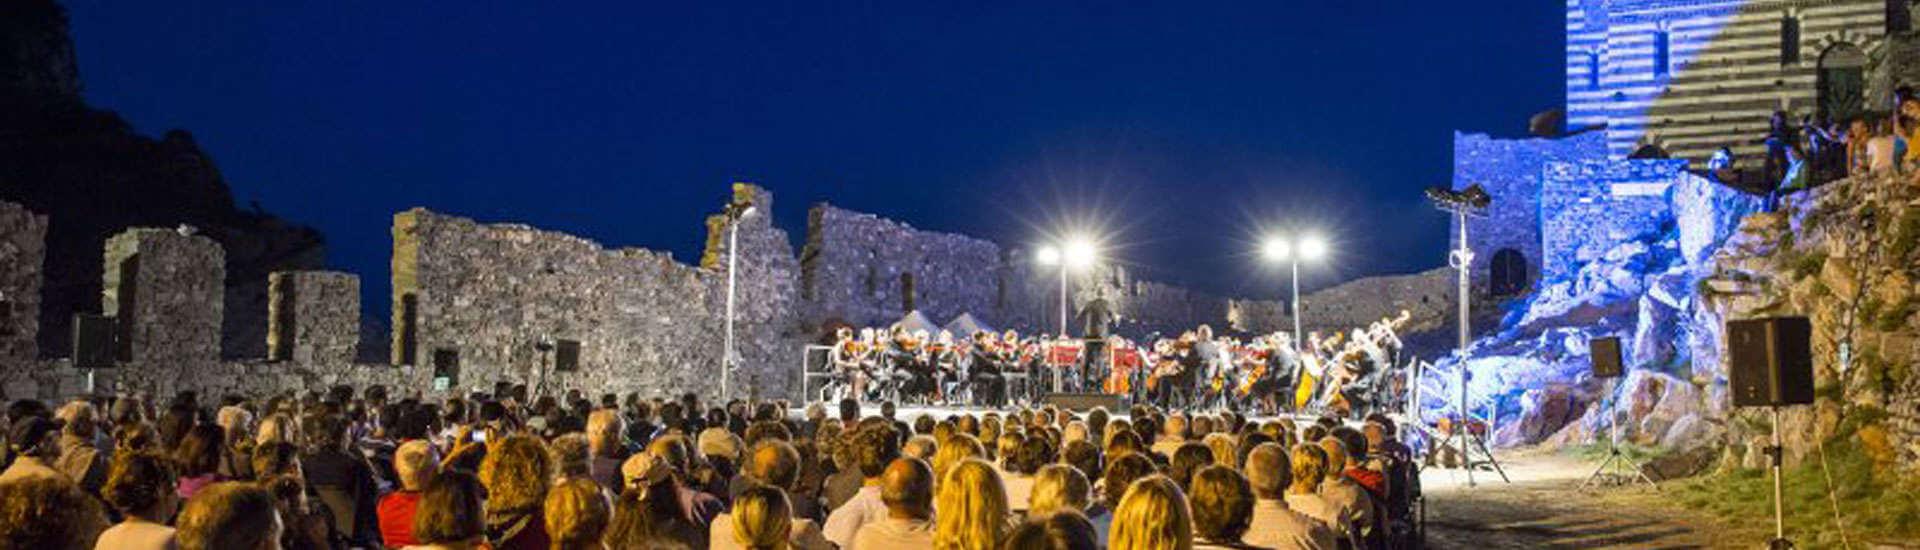 Jazz Music Festival in Portovenere, Liguria